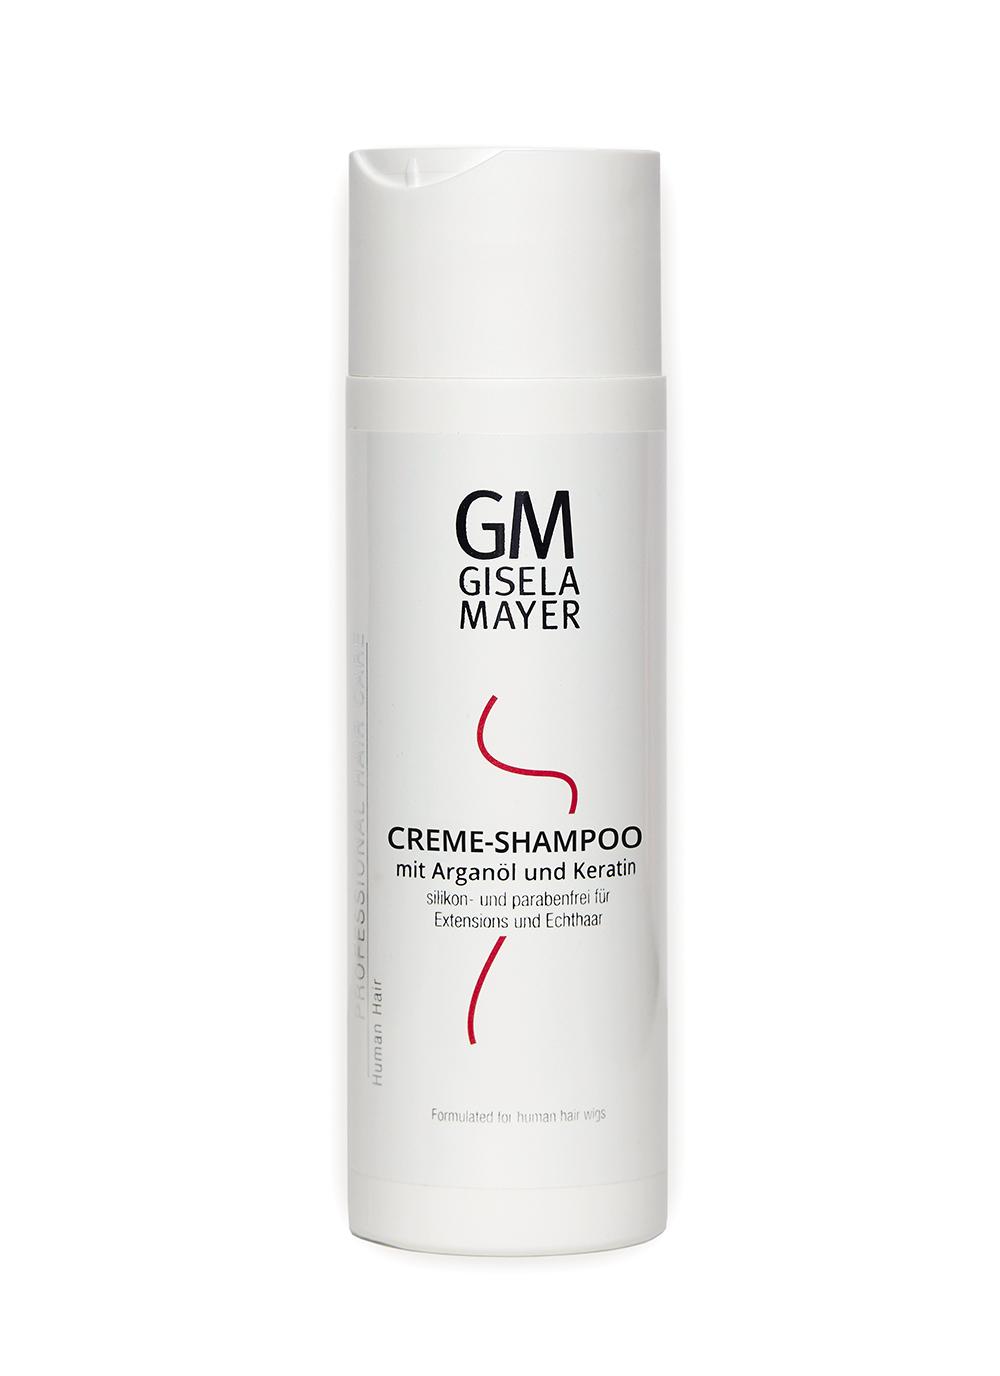 Gisela Mayer Zubehör: Crème Shampoo Echthaar 200ml